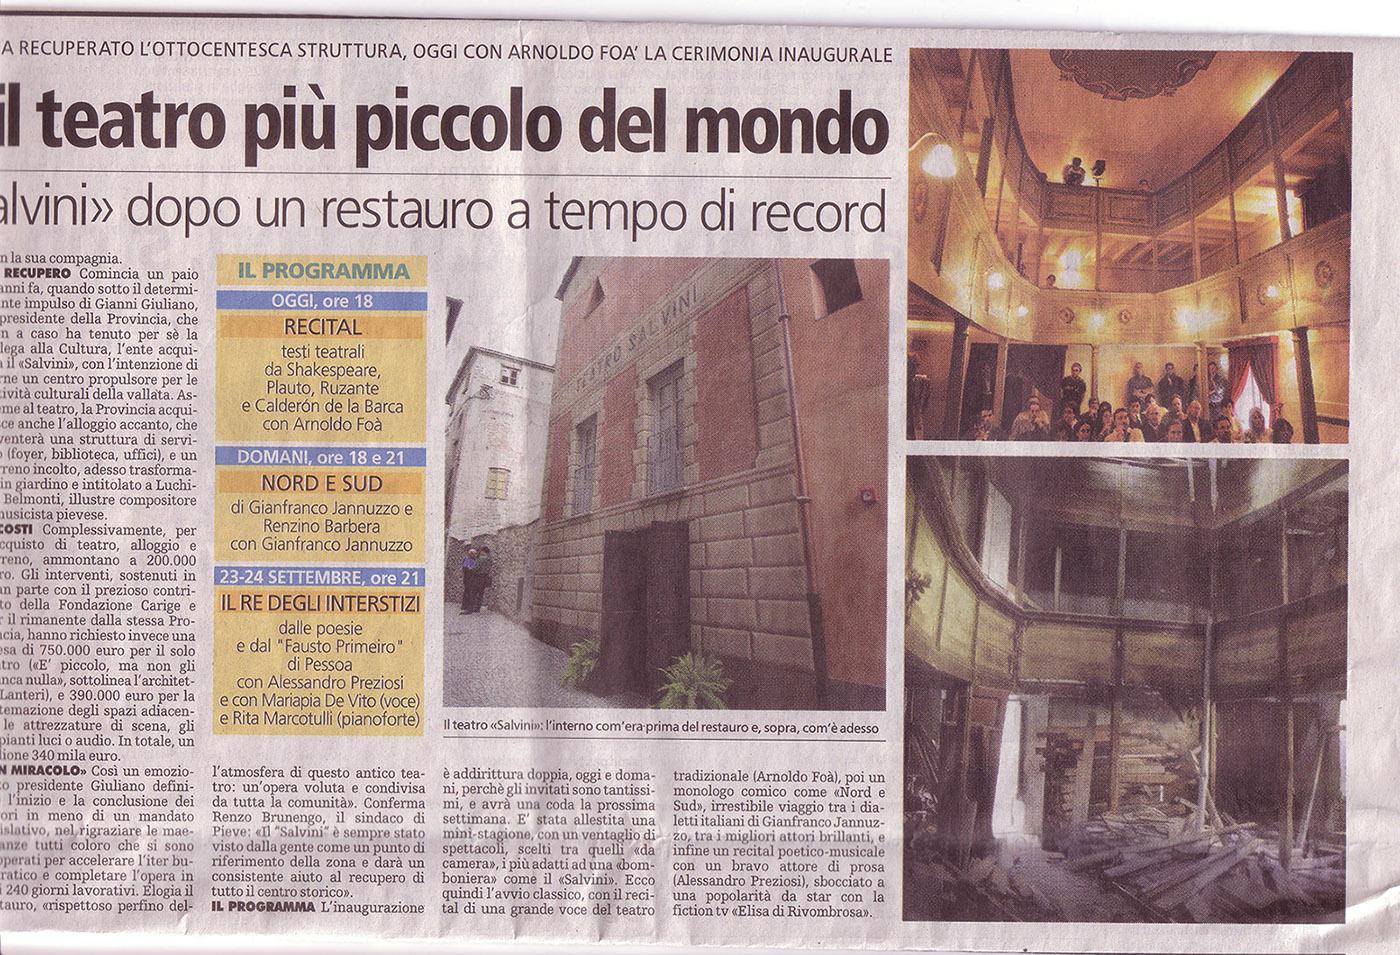 La Stampa, 17/9/2004